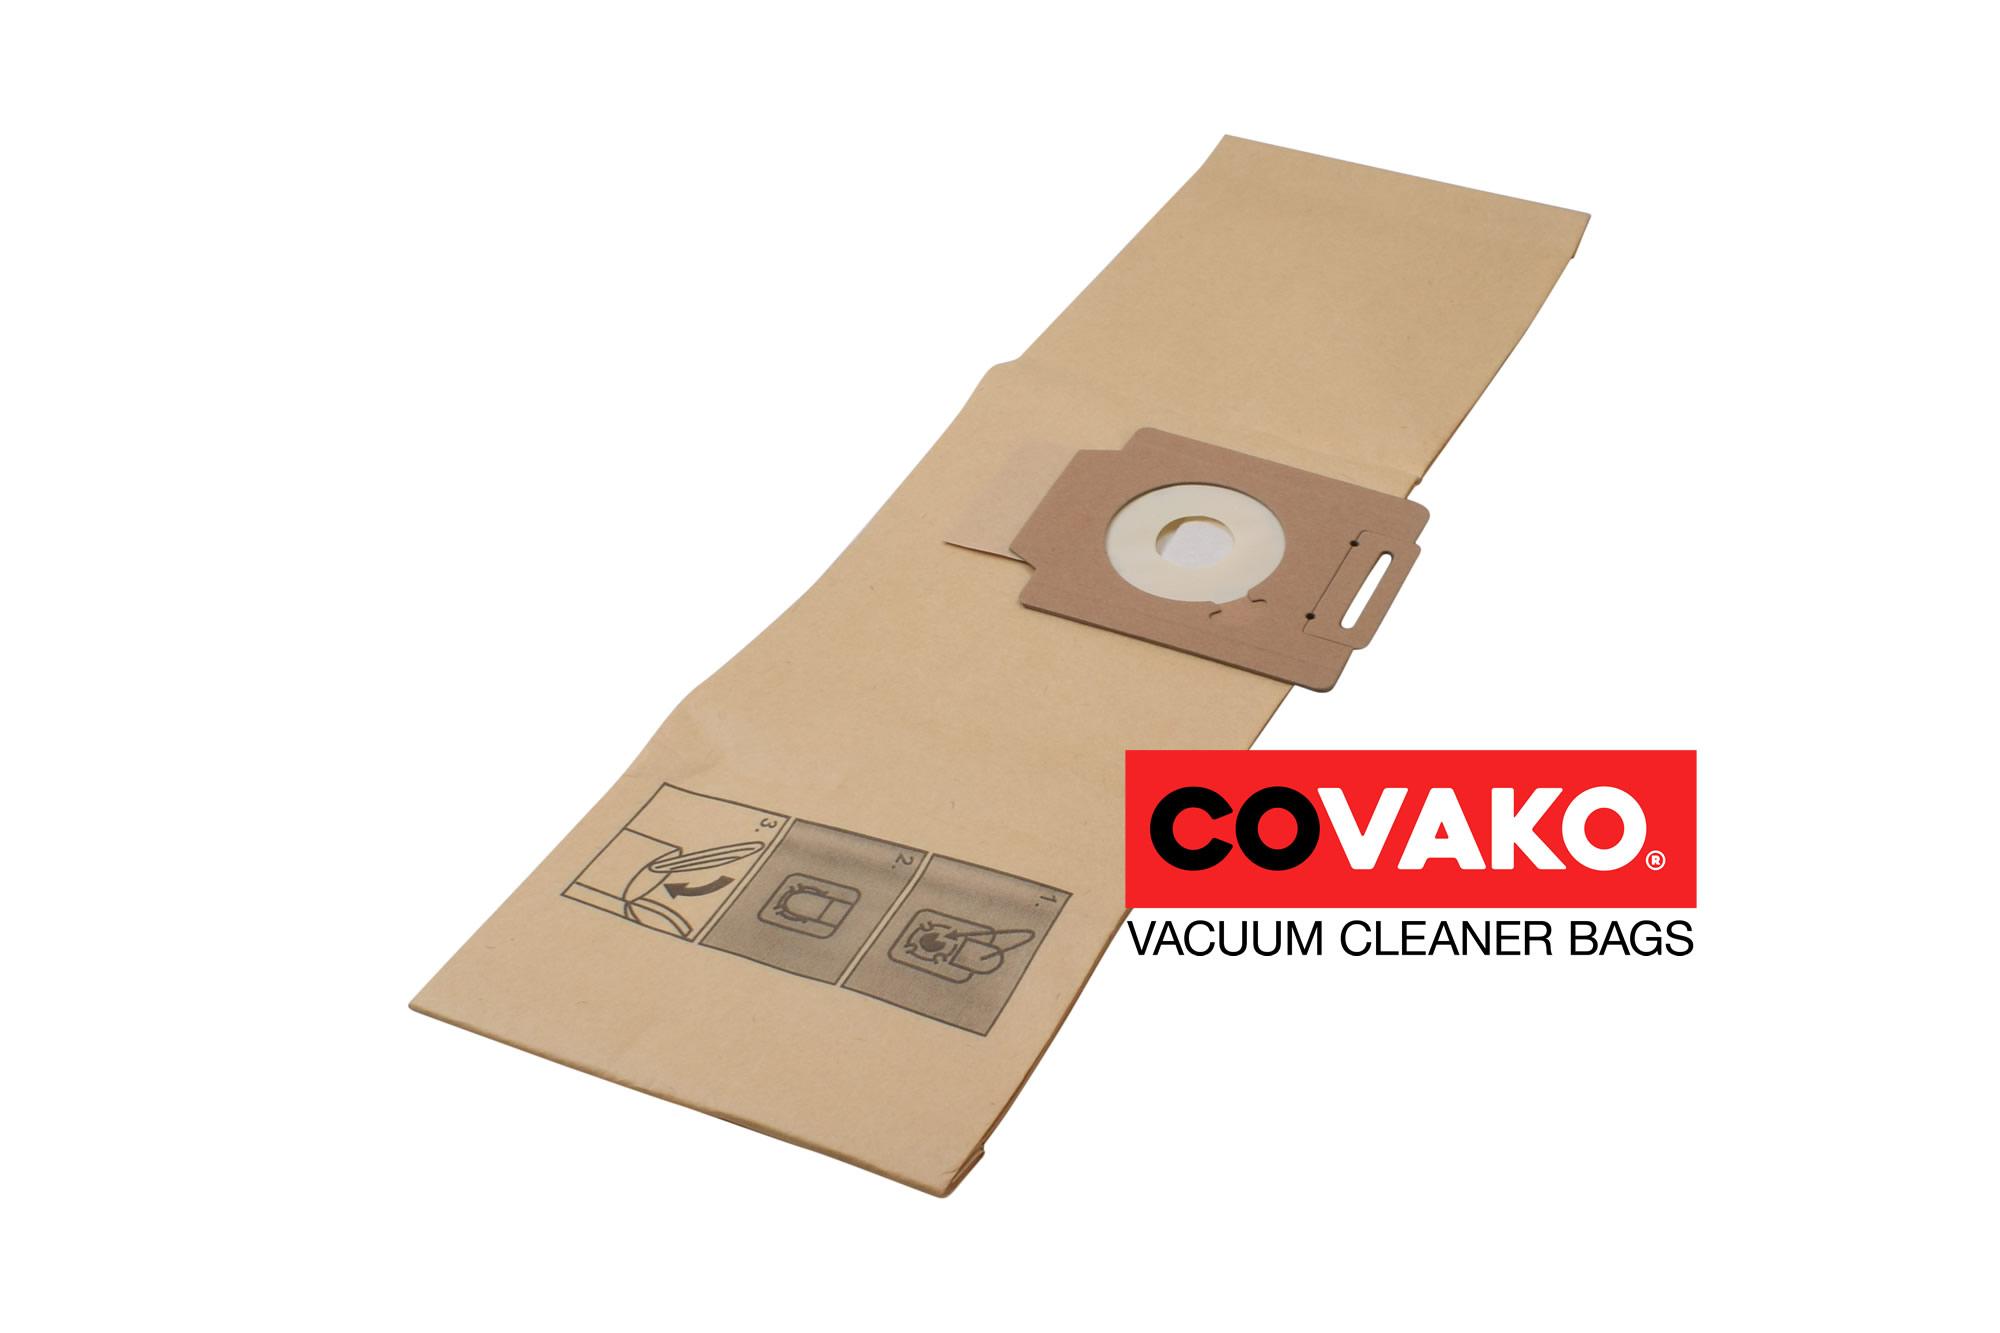 Wetrok Monovac 6 / Papier - Wetrok sacs d'aspirateur